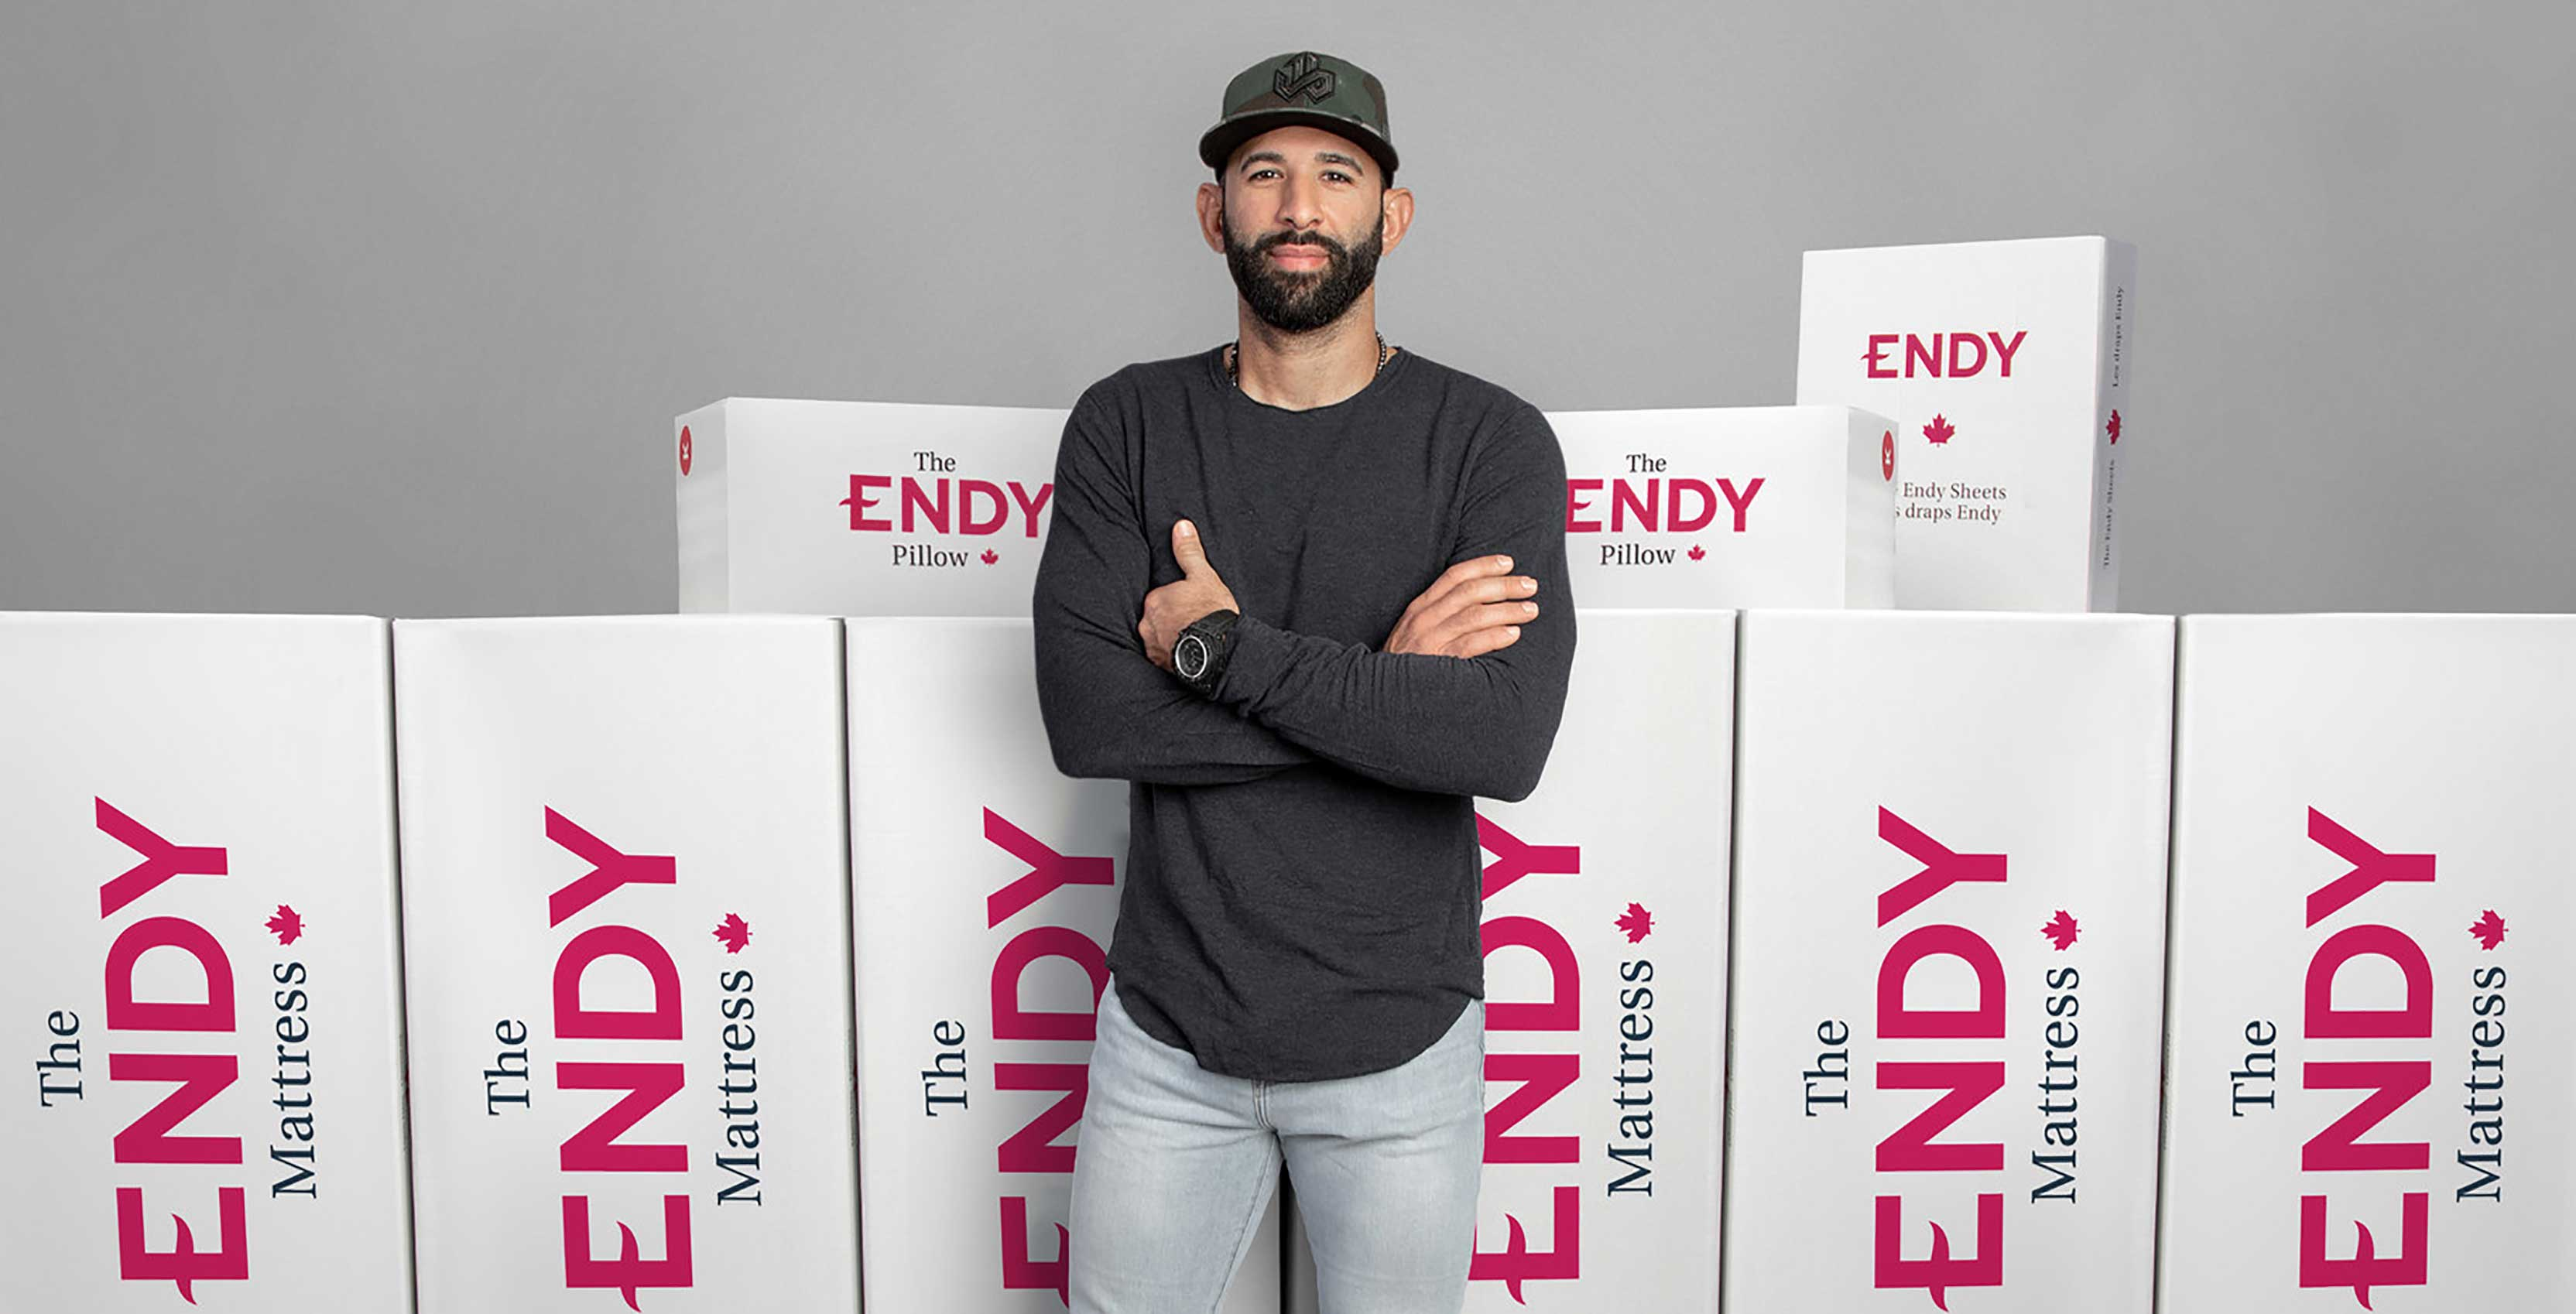 José Bautista Endy mattress